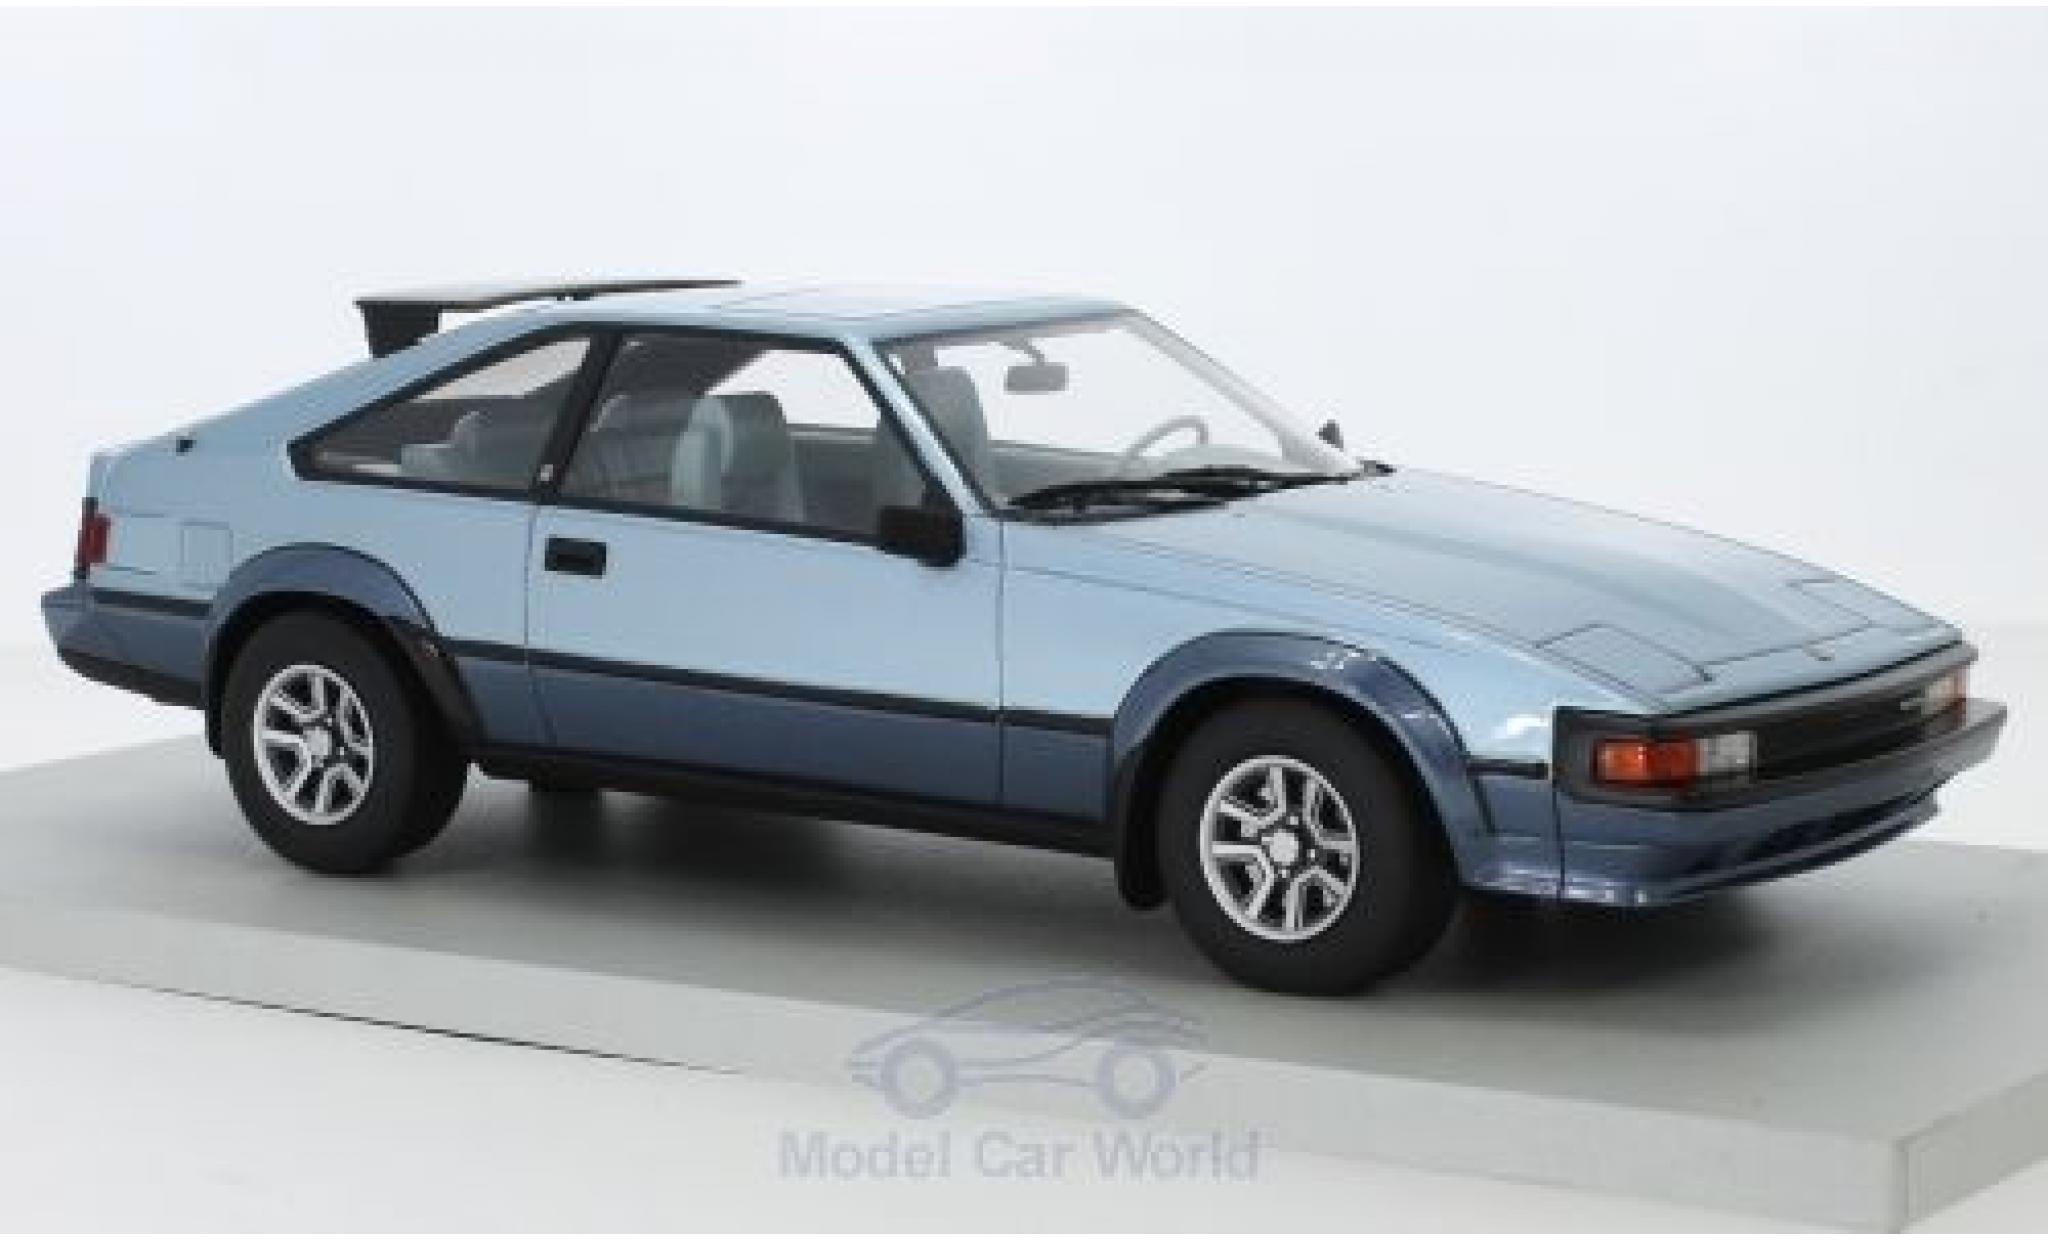 Toyota Celica 1/18 Lucky Step Models Supra MkII mettalic blau/mettalic blau